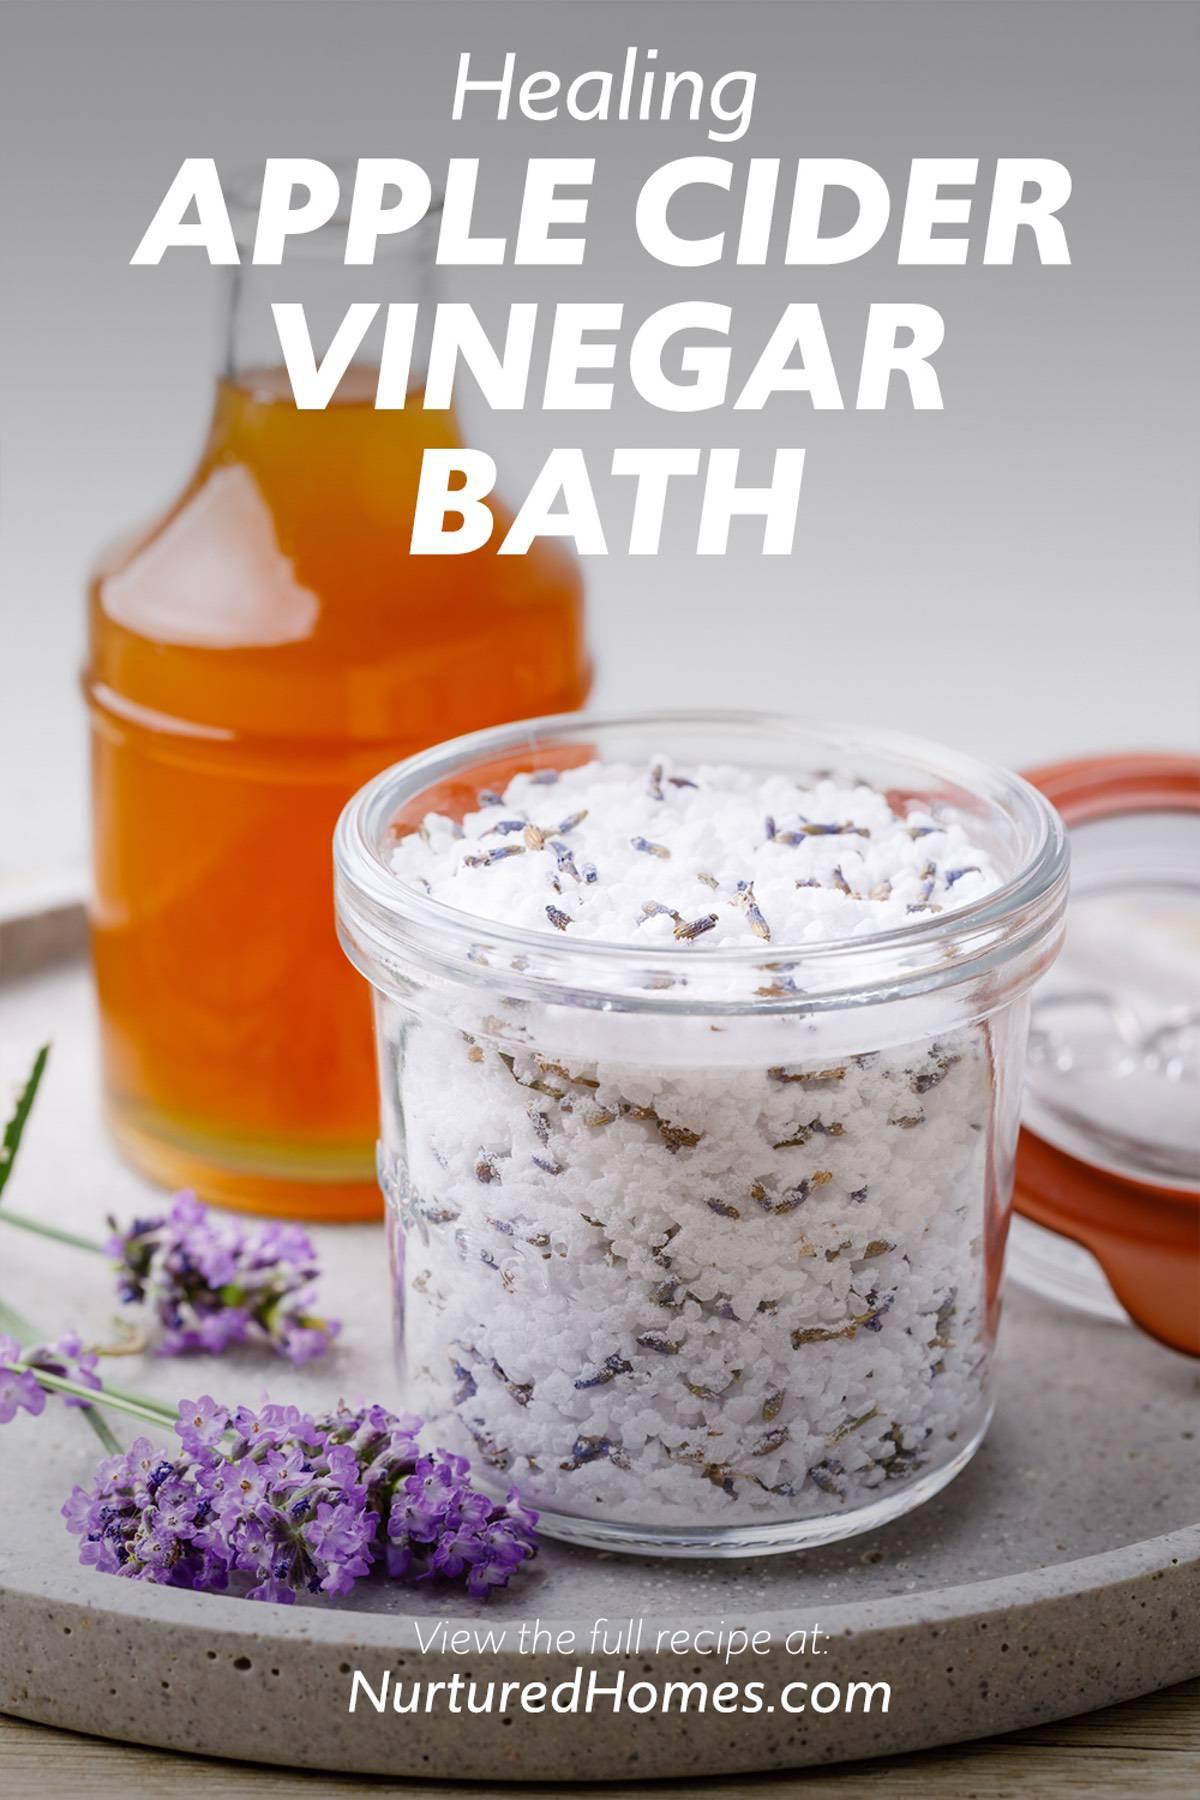 Healing Apple Cider Vinegar Bath Recipe